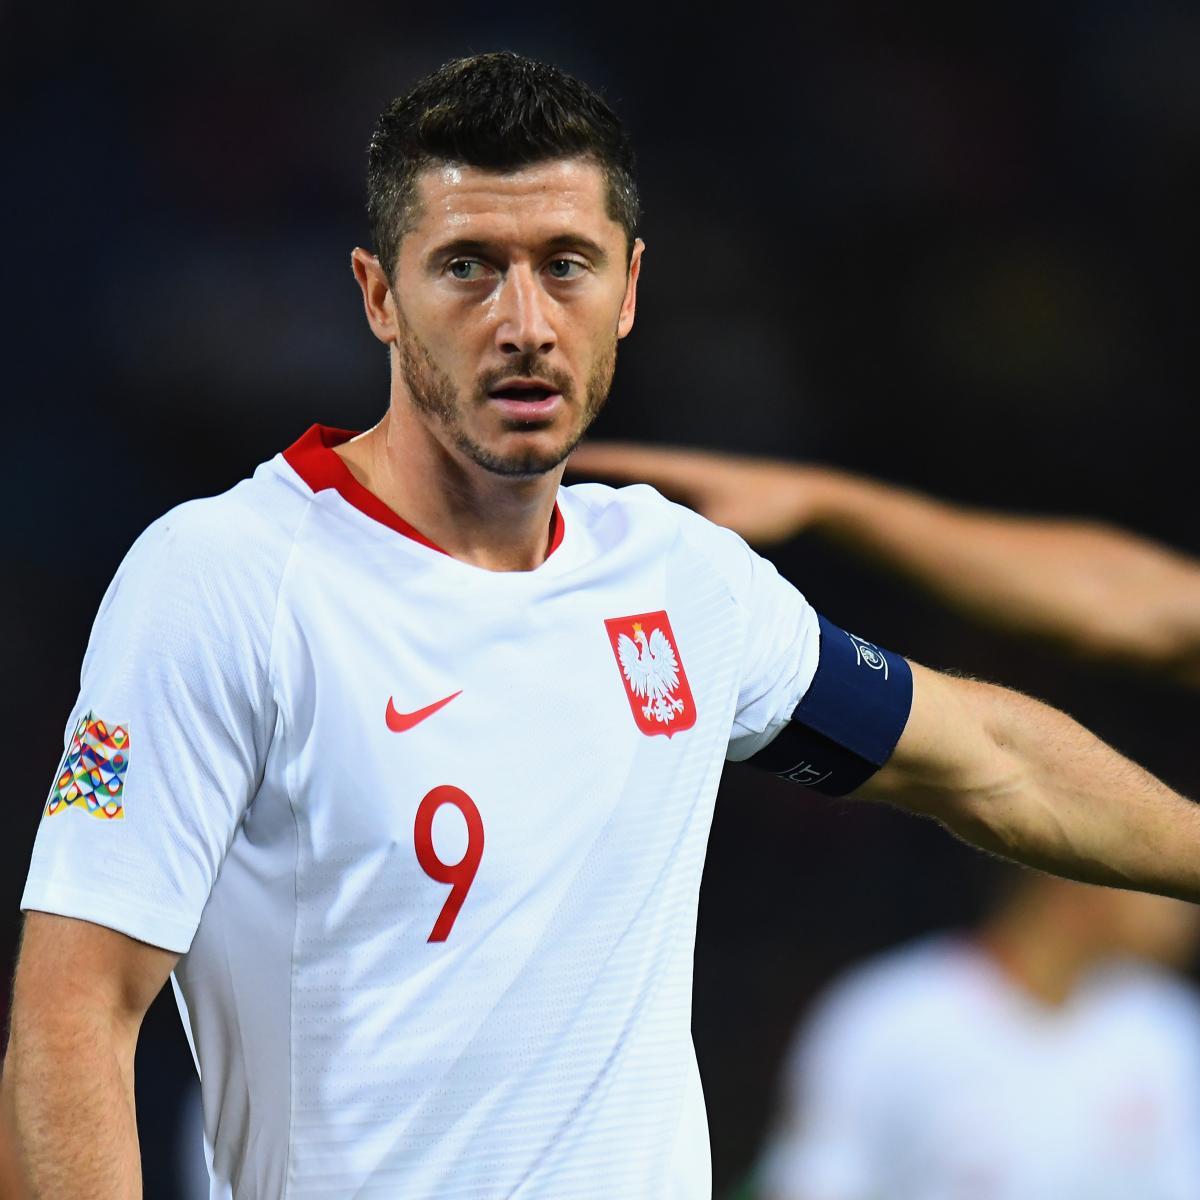 Polen Vs Portugal Live